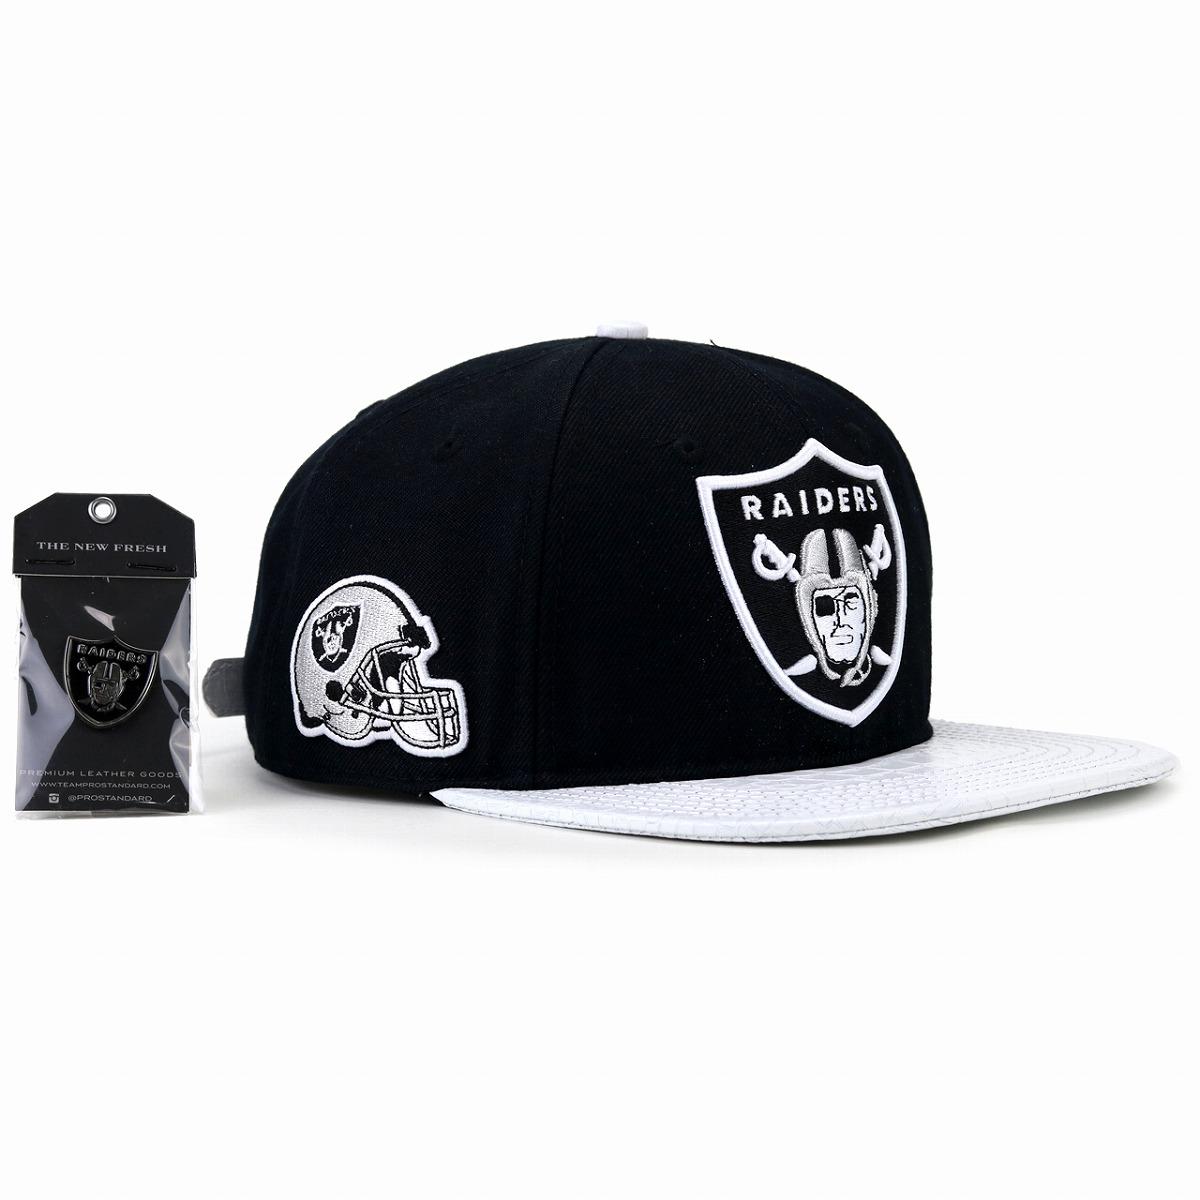 Black   white. A brand PROSTANDARD. Professional standard NFL logo cap ... bdfb2da74d7